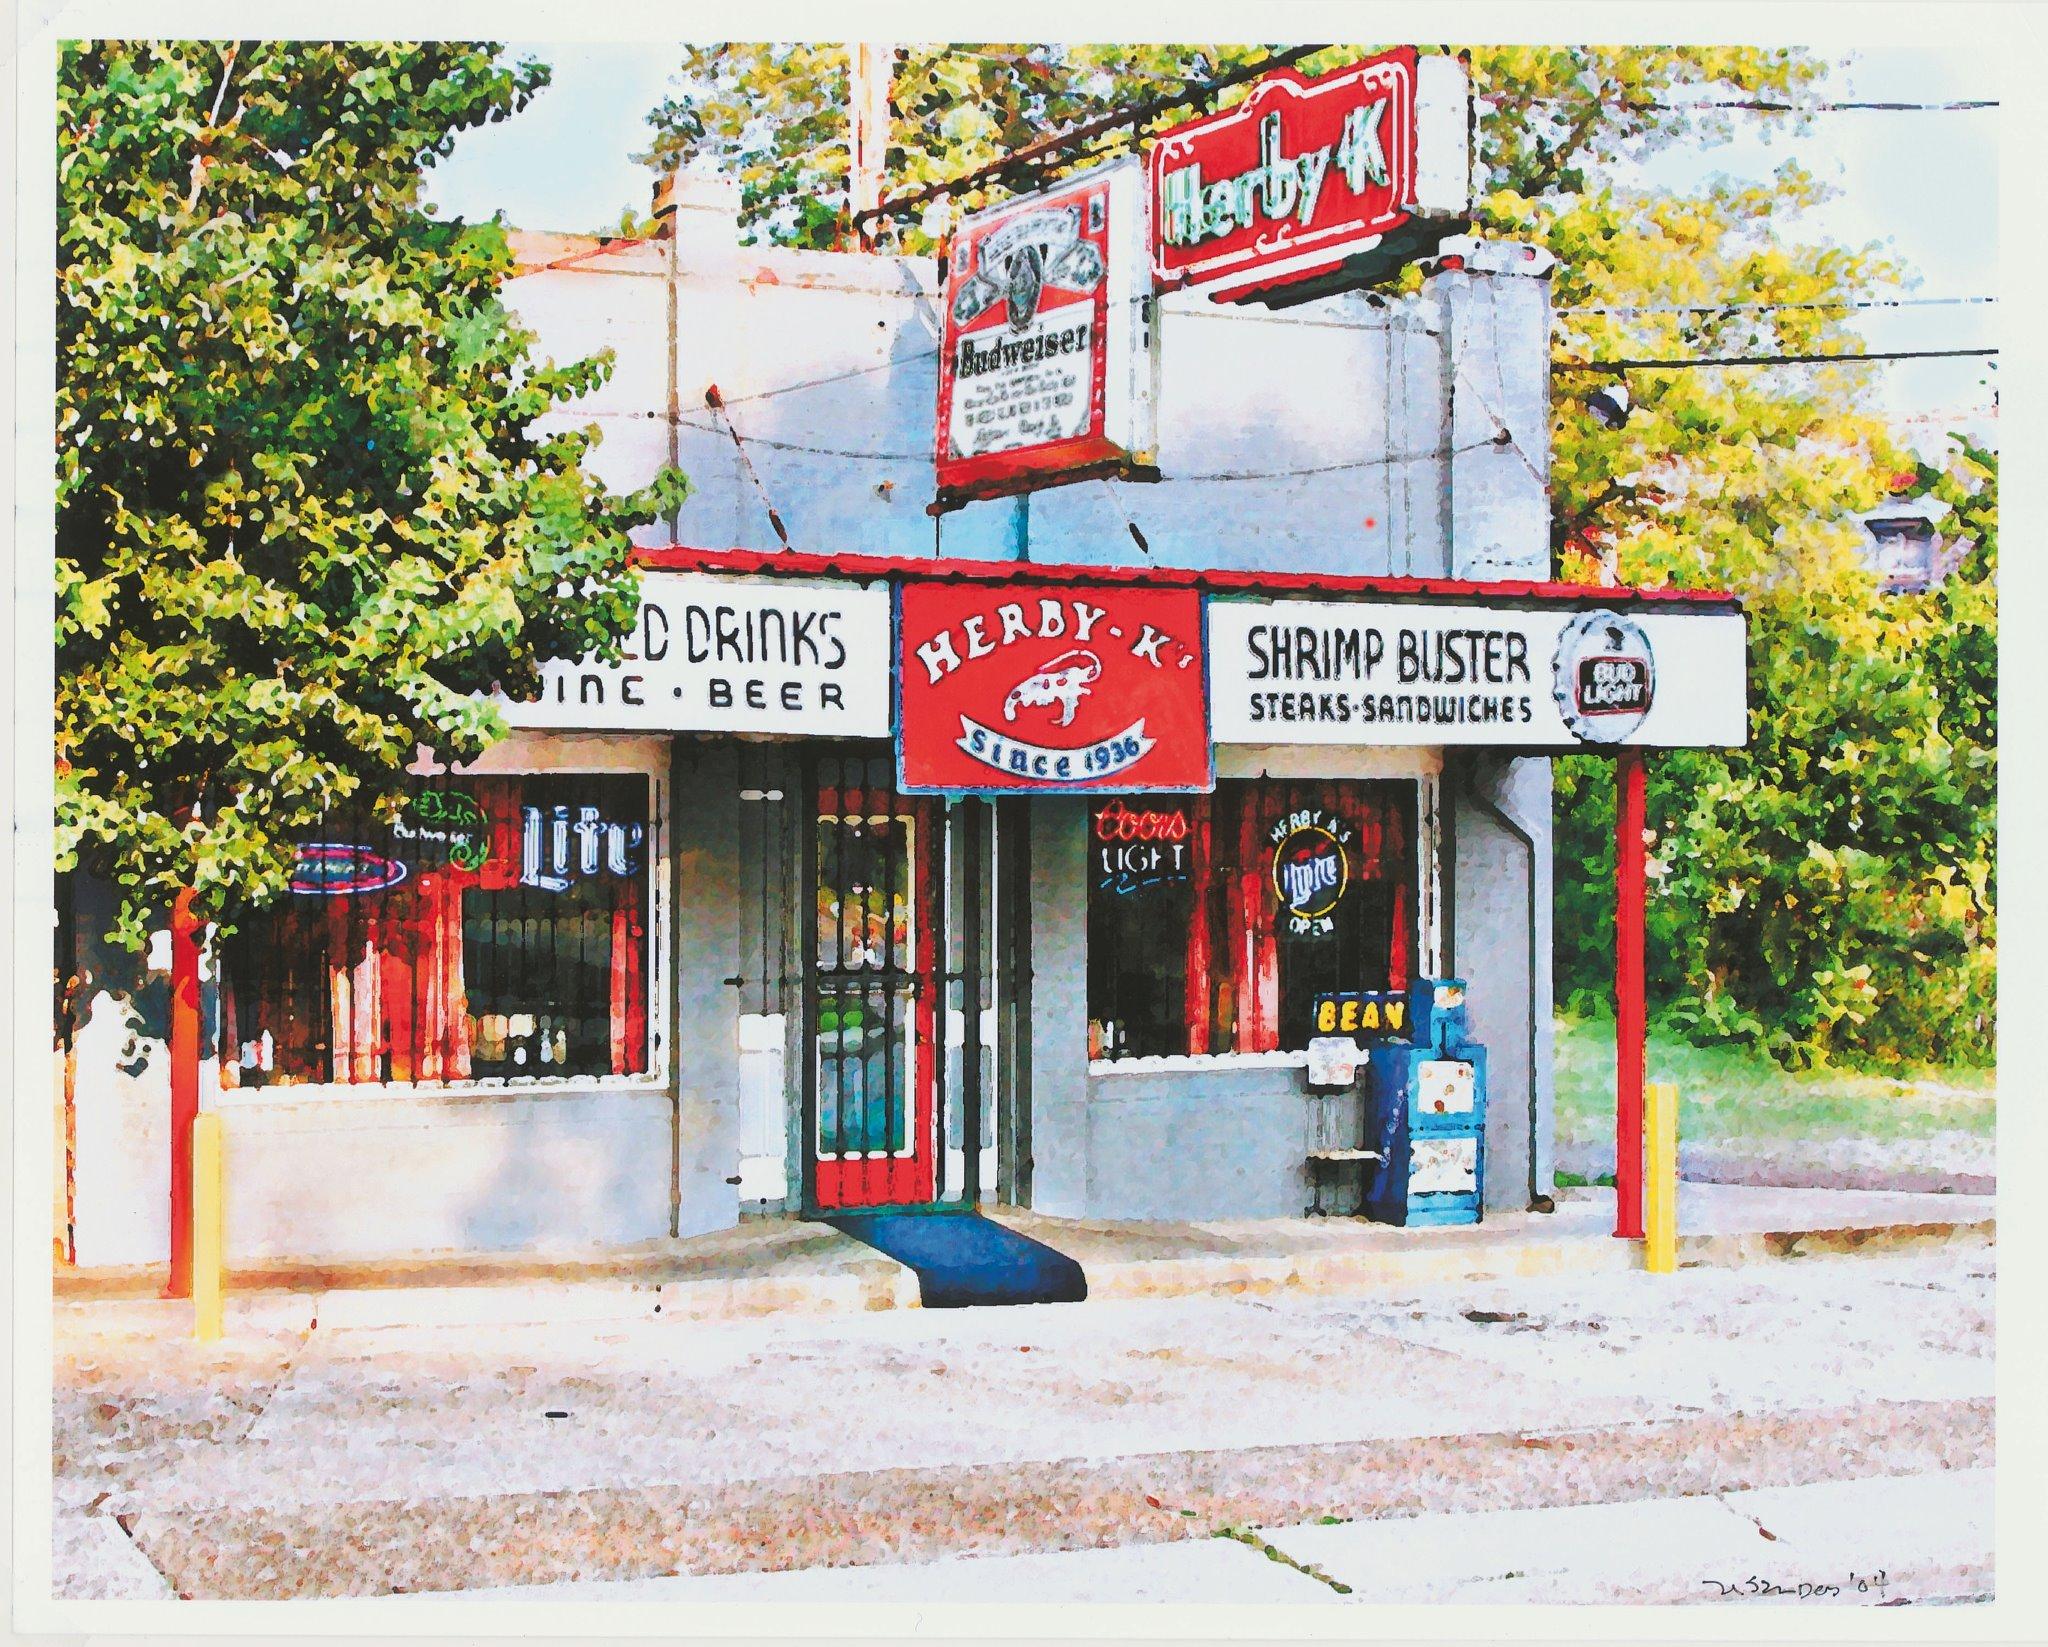 Best Seafood Restaurant Lake Charles